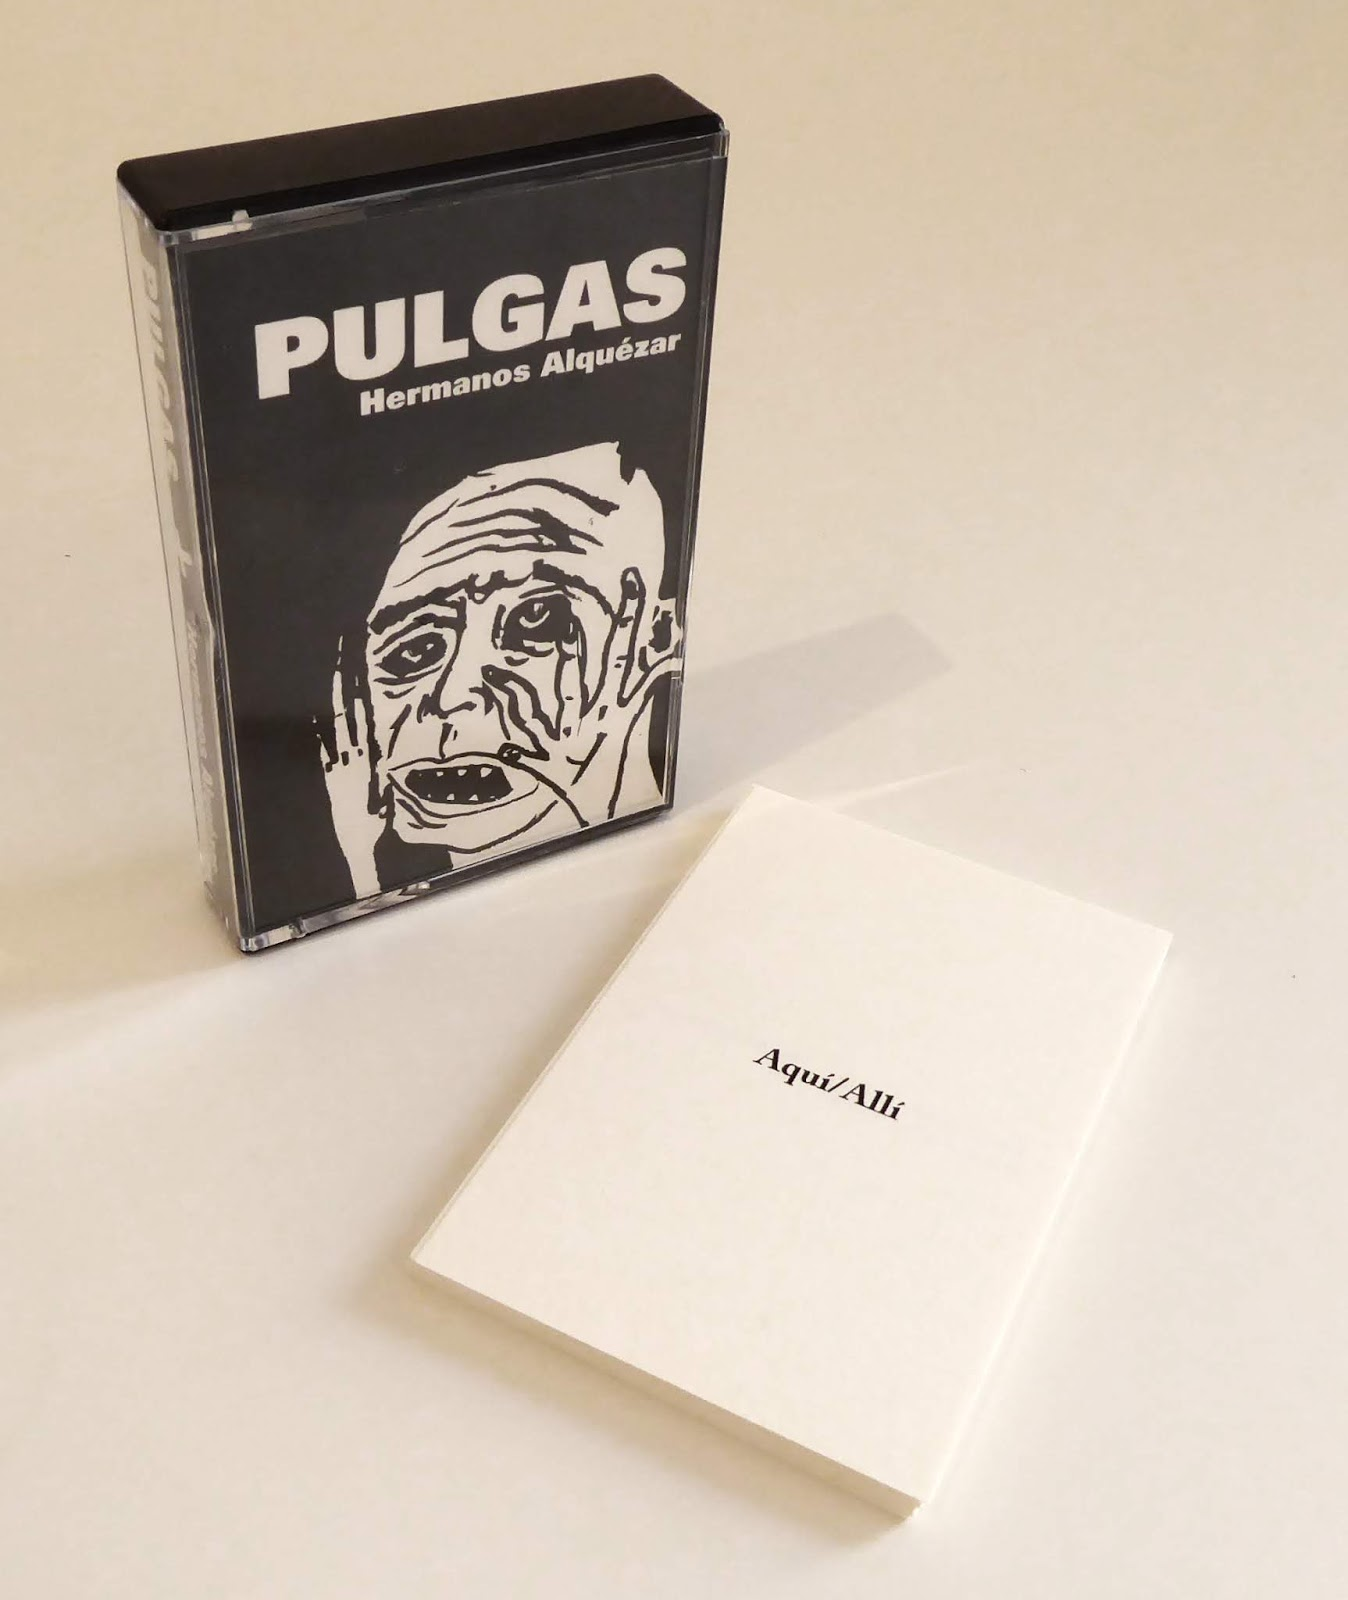 http://www.colectivolamaquina.org/2019/11/pulgas-lm007-es-una-antologia-de.html